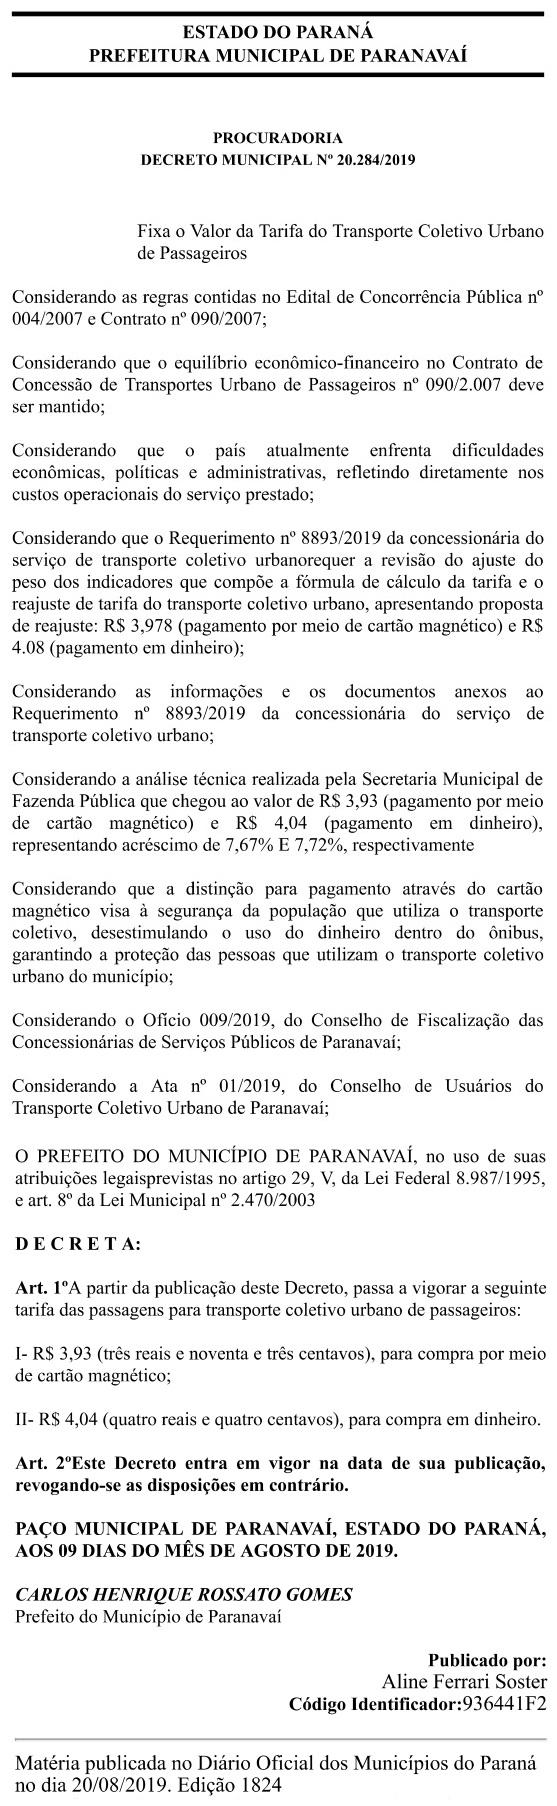 paranavai_decreto_page-0001.jpg